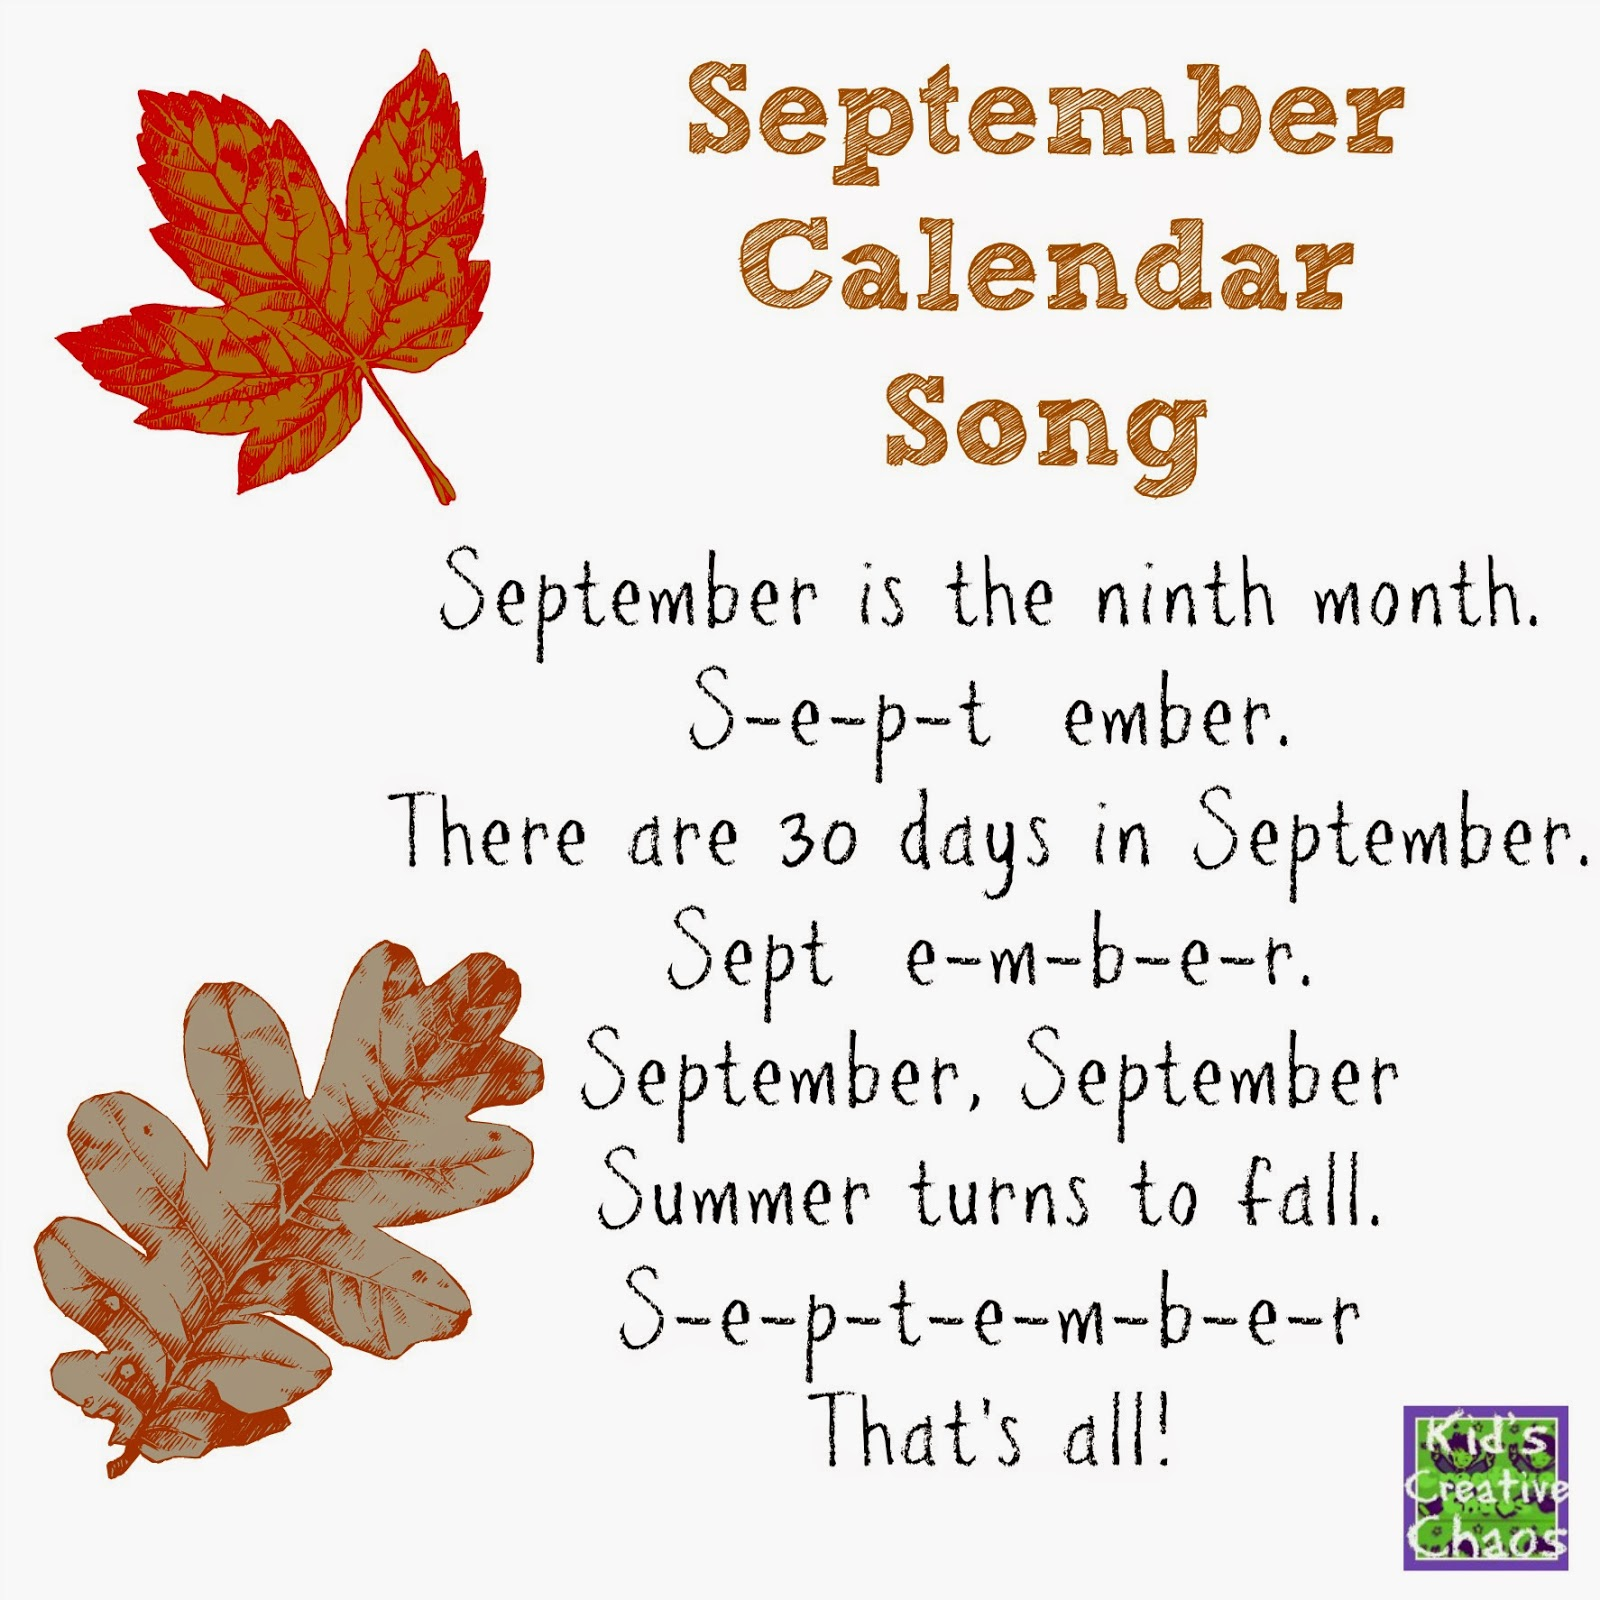 September Calendar Song